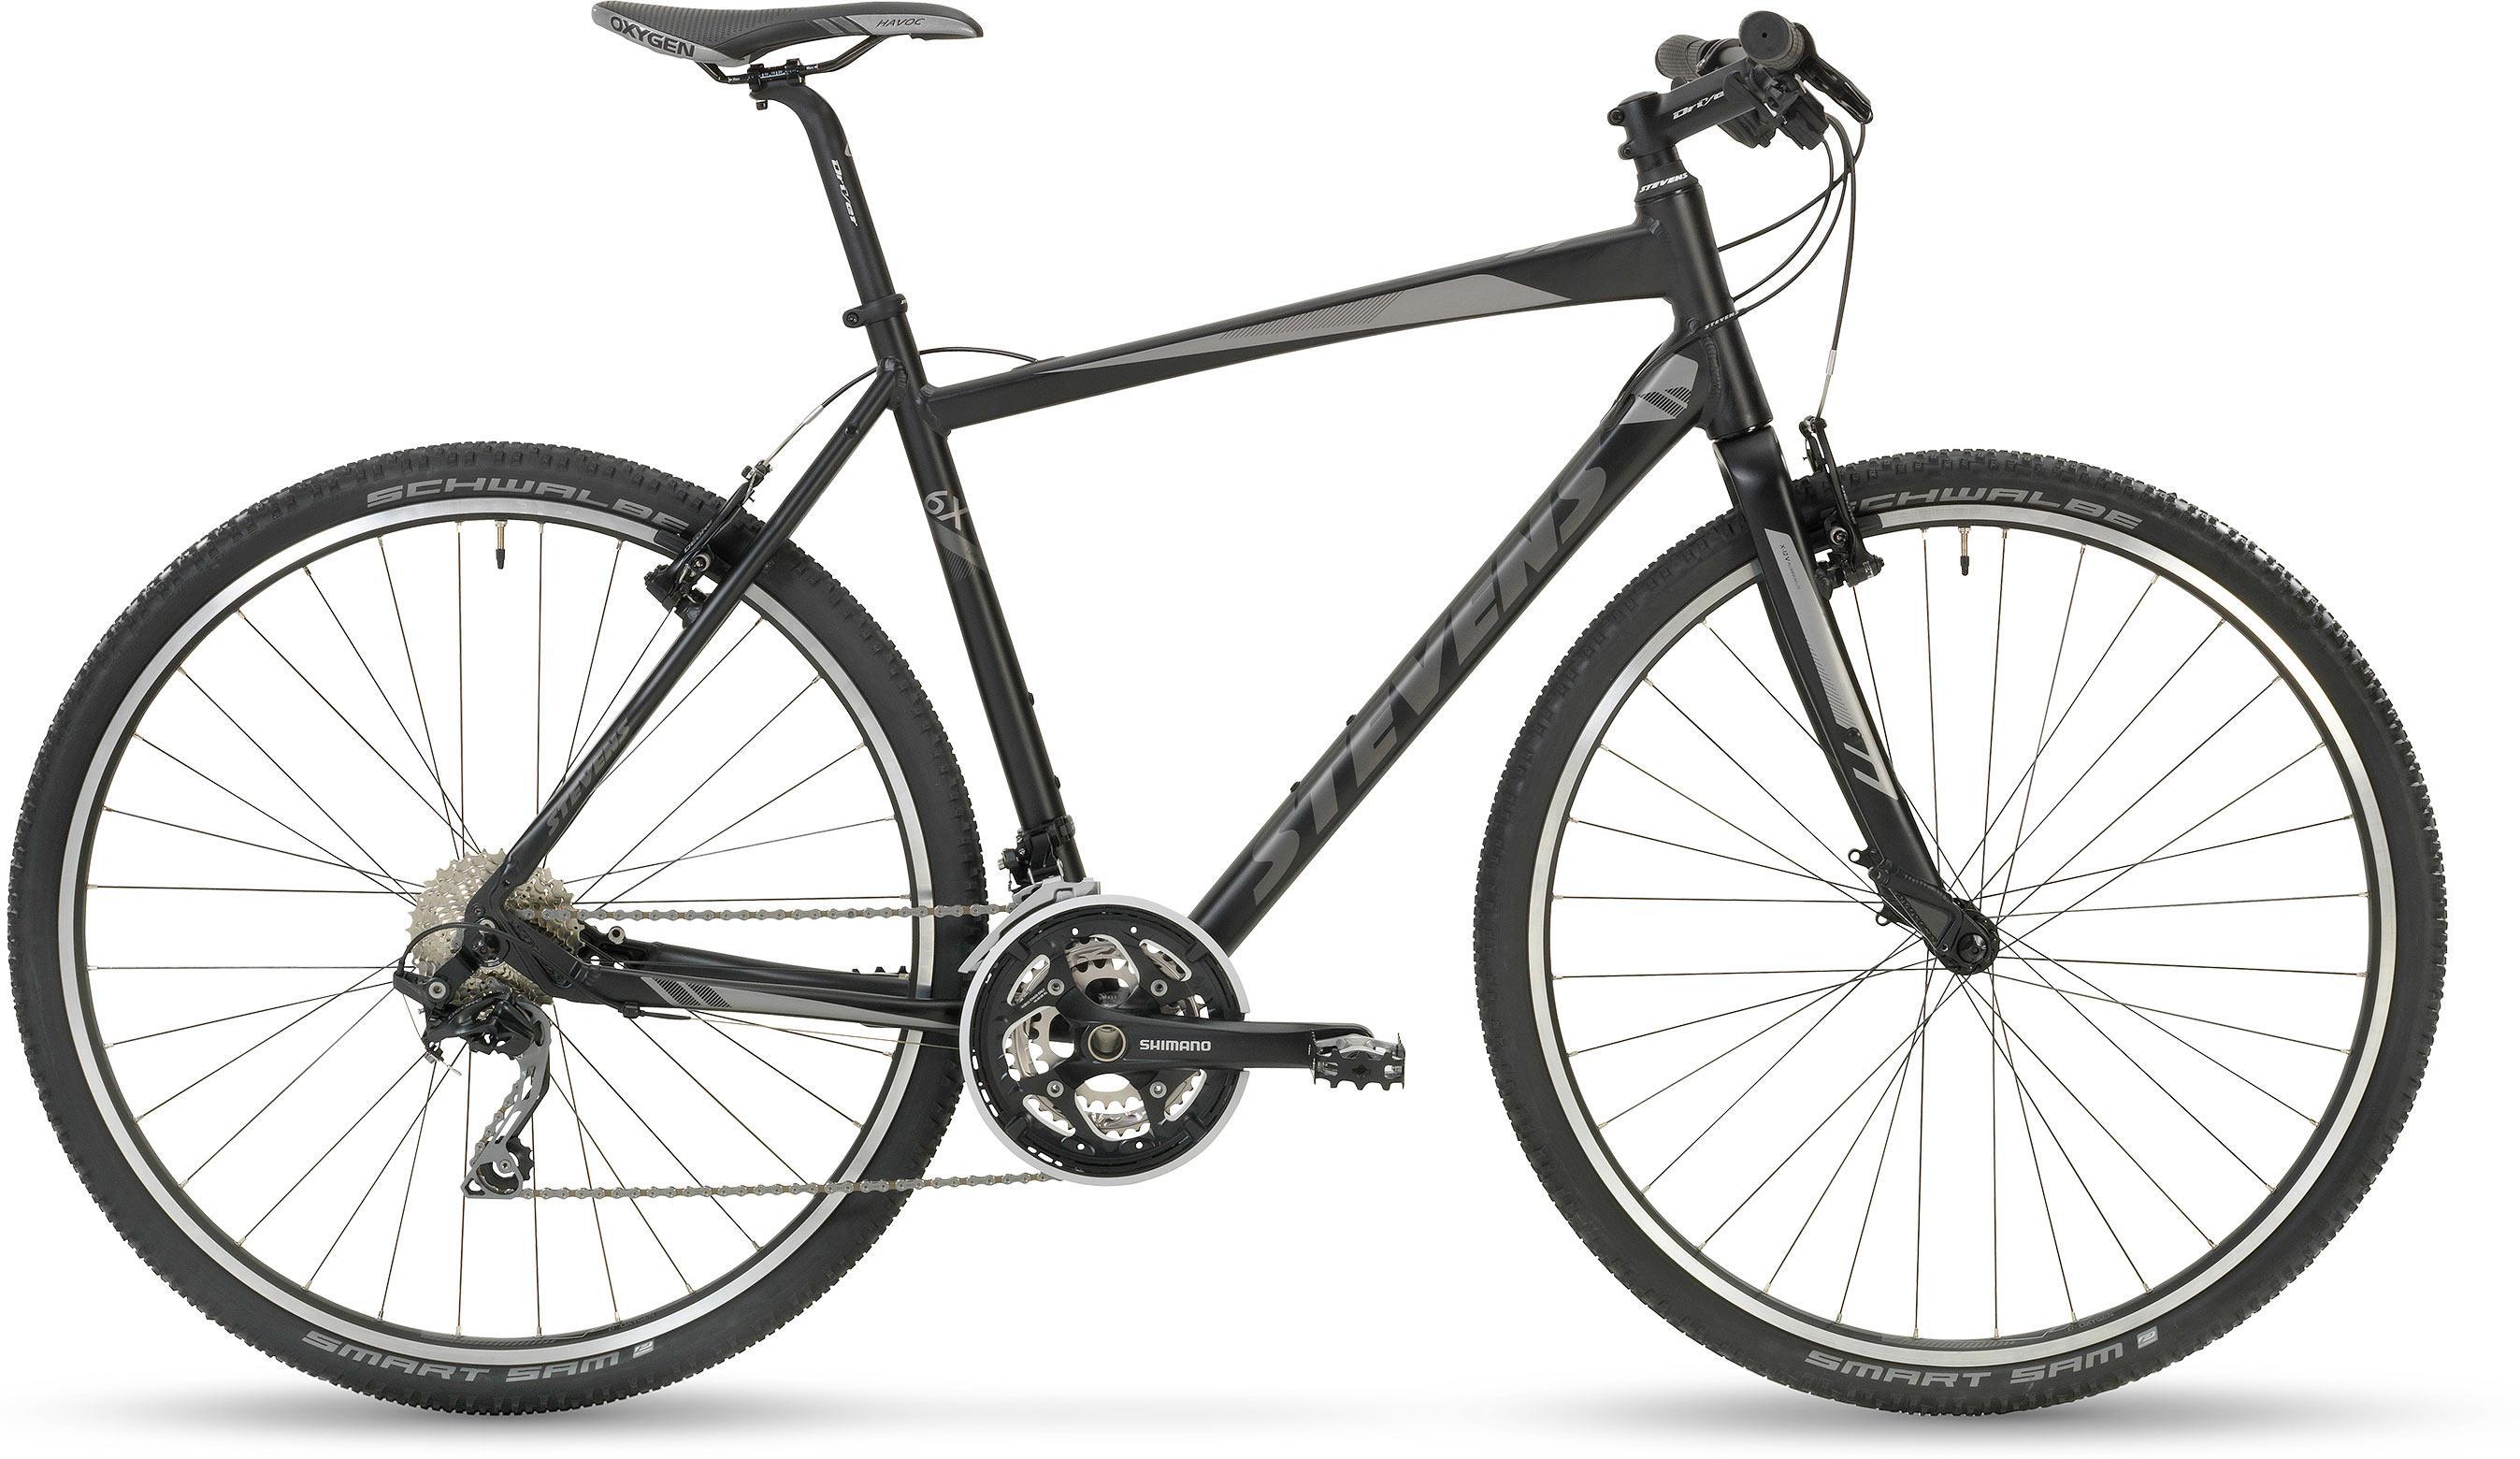 Stevens 6X Lite City Bikes / Fitnessräder 2017